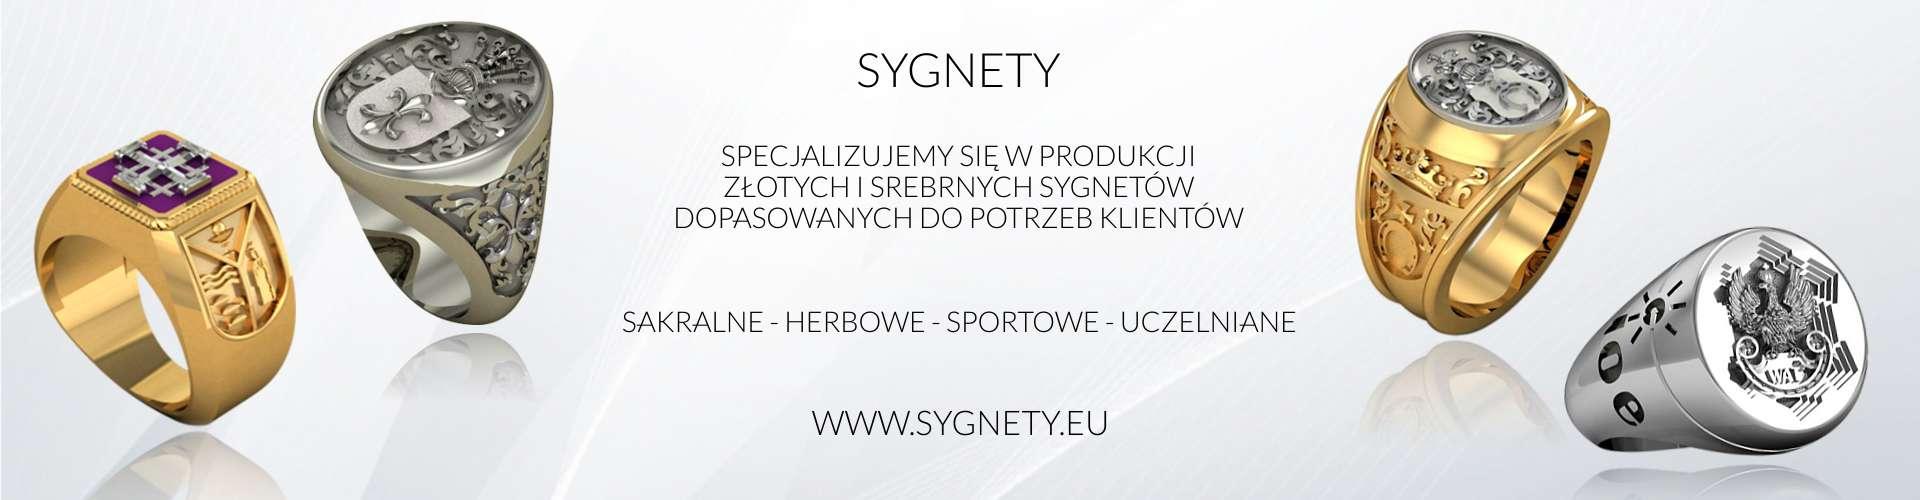 www.sygnety.eu